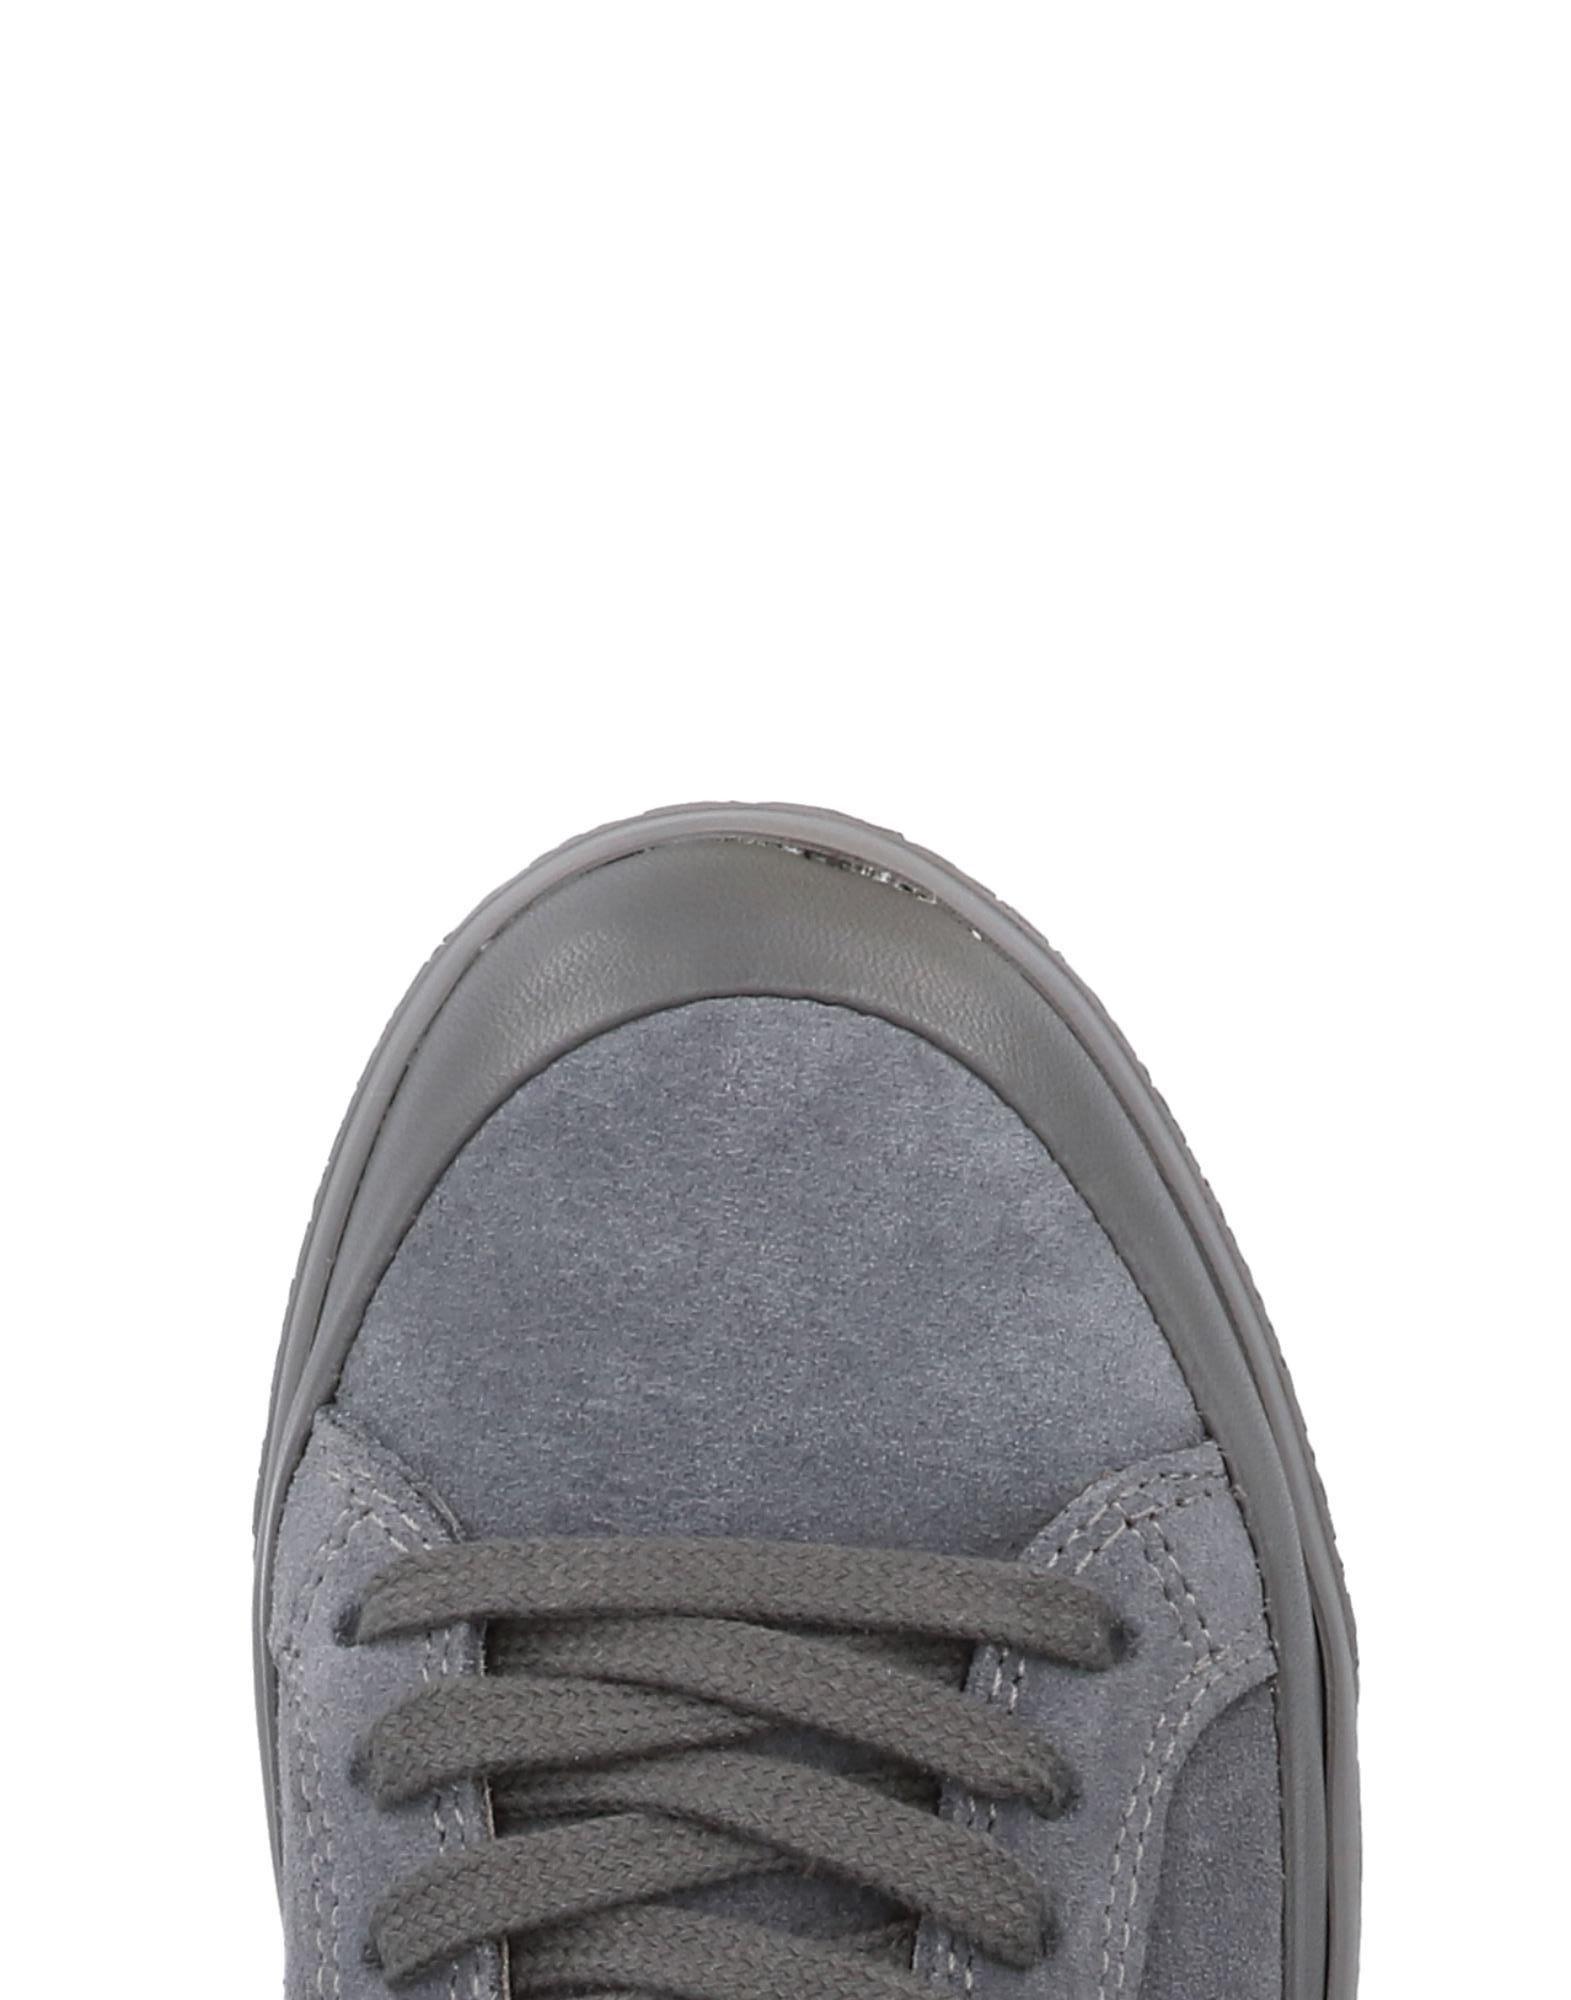 Stilvolle billige Schuhe Pantofola D'oro Sneakers Damen  11455999DL